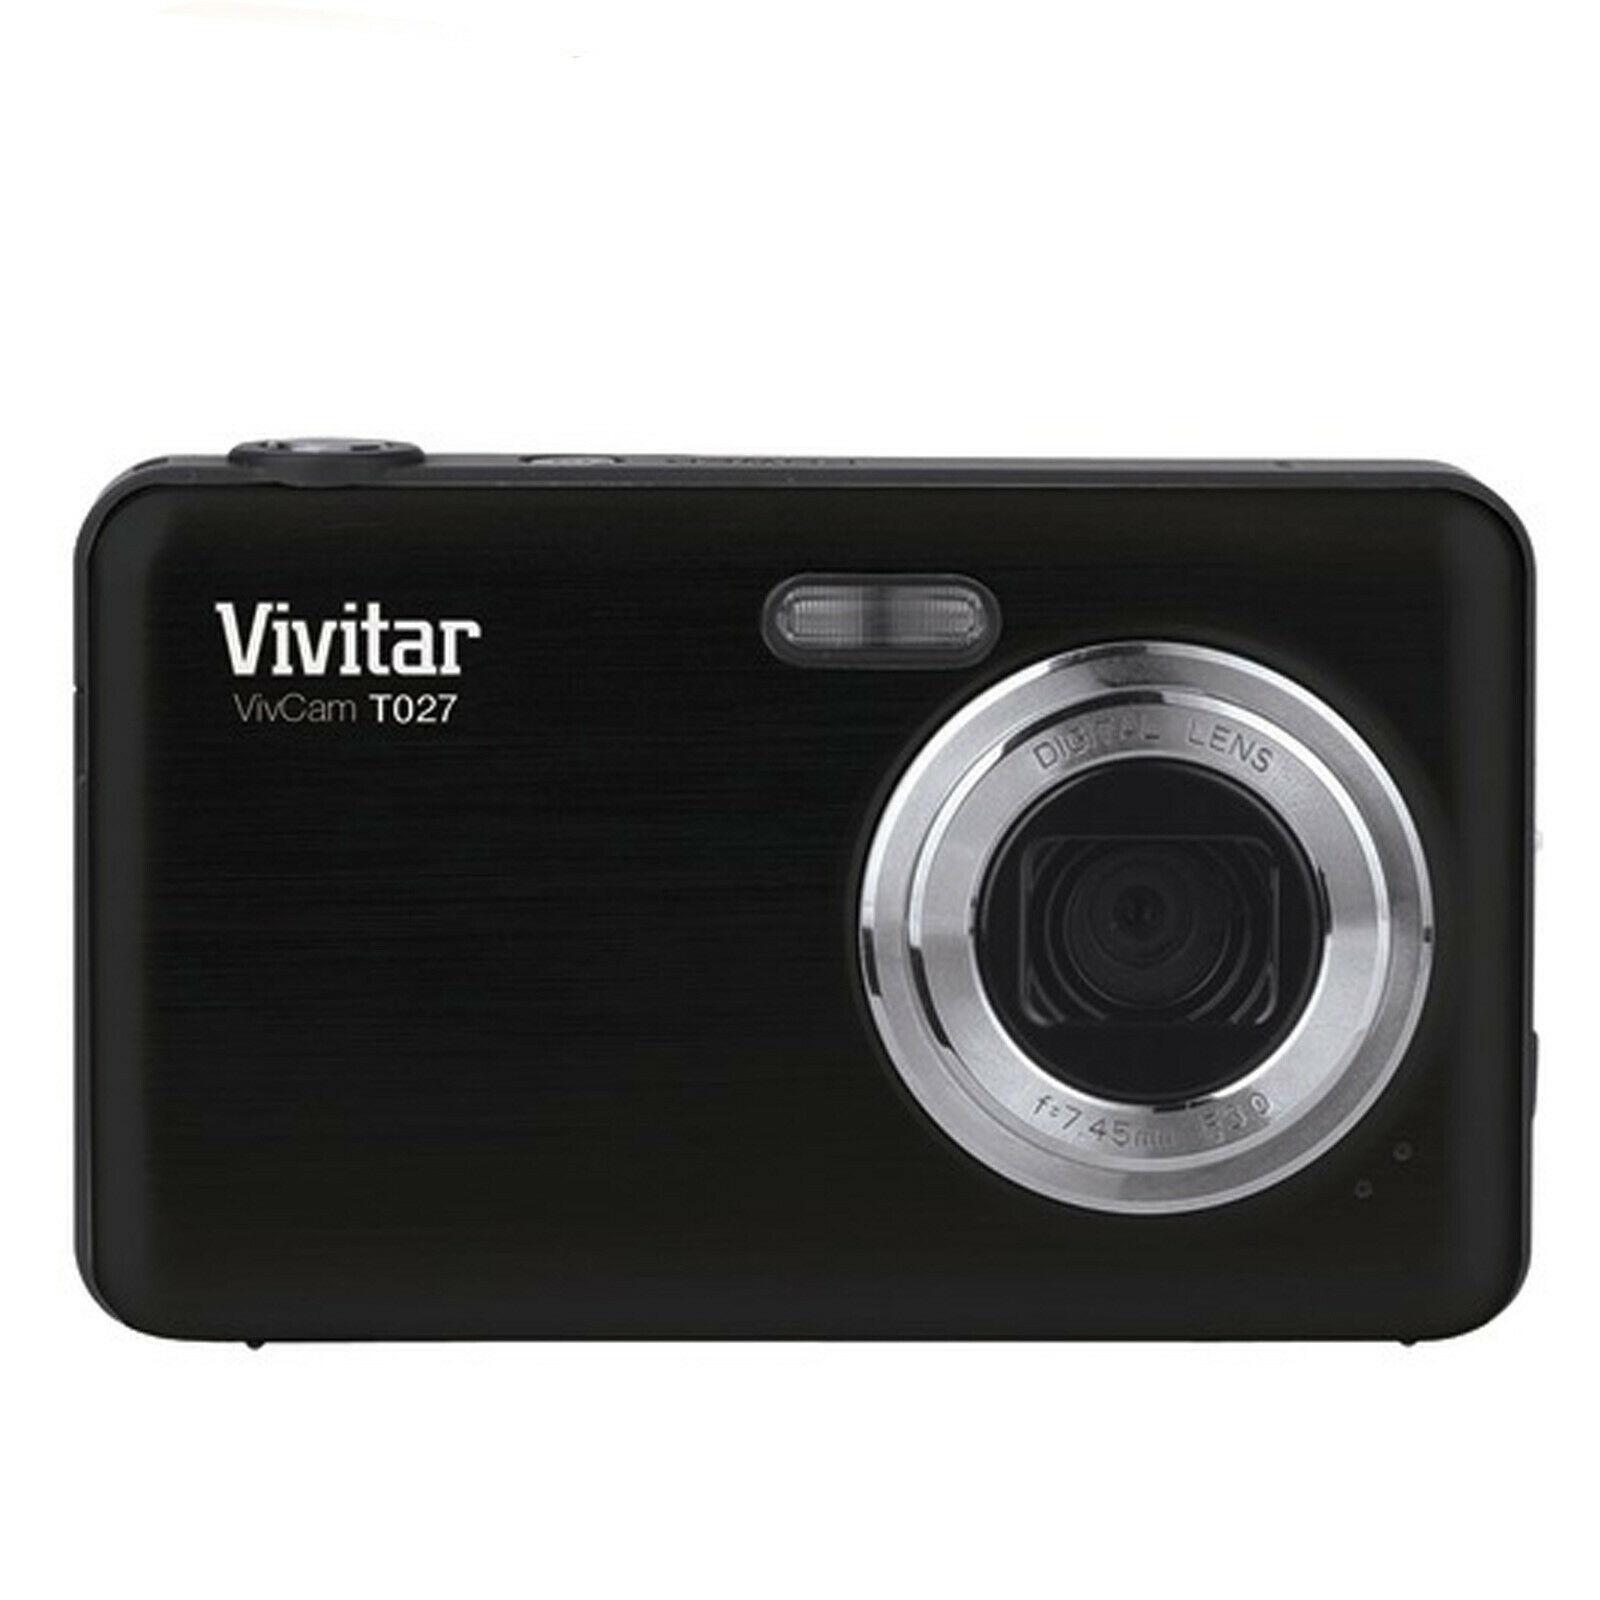 Vivitar Digital Camera with 12.1 Megapixels-Black - $49.96